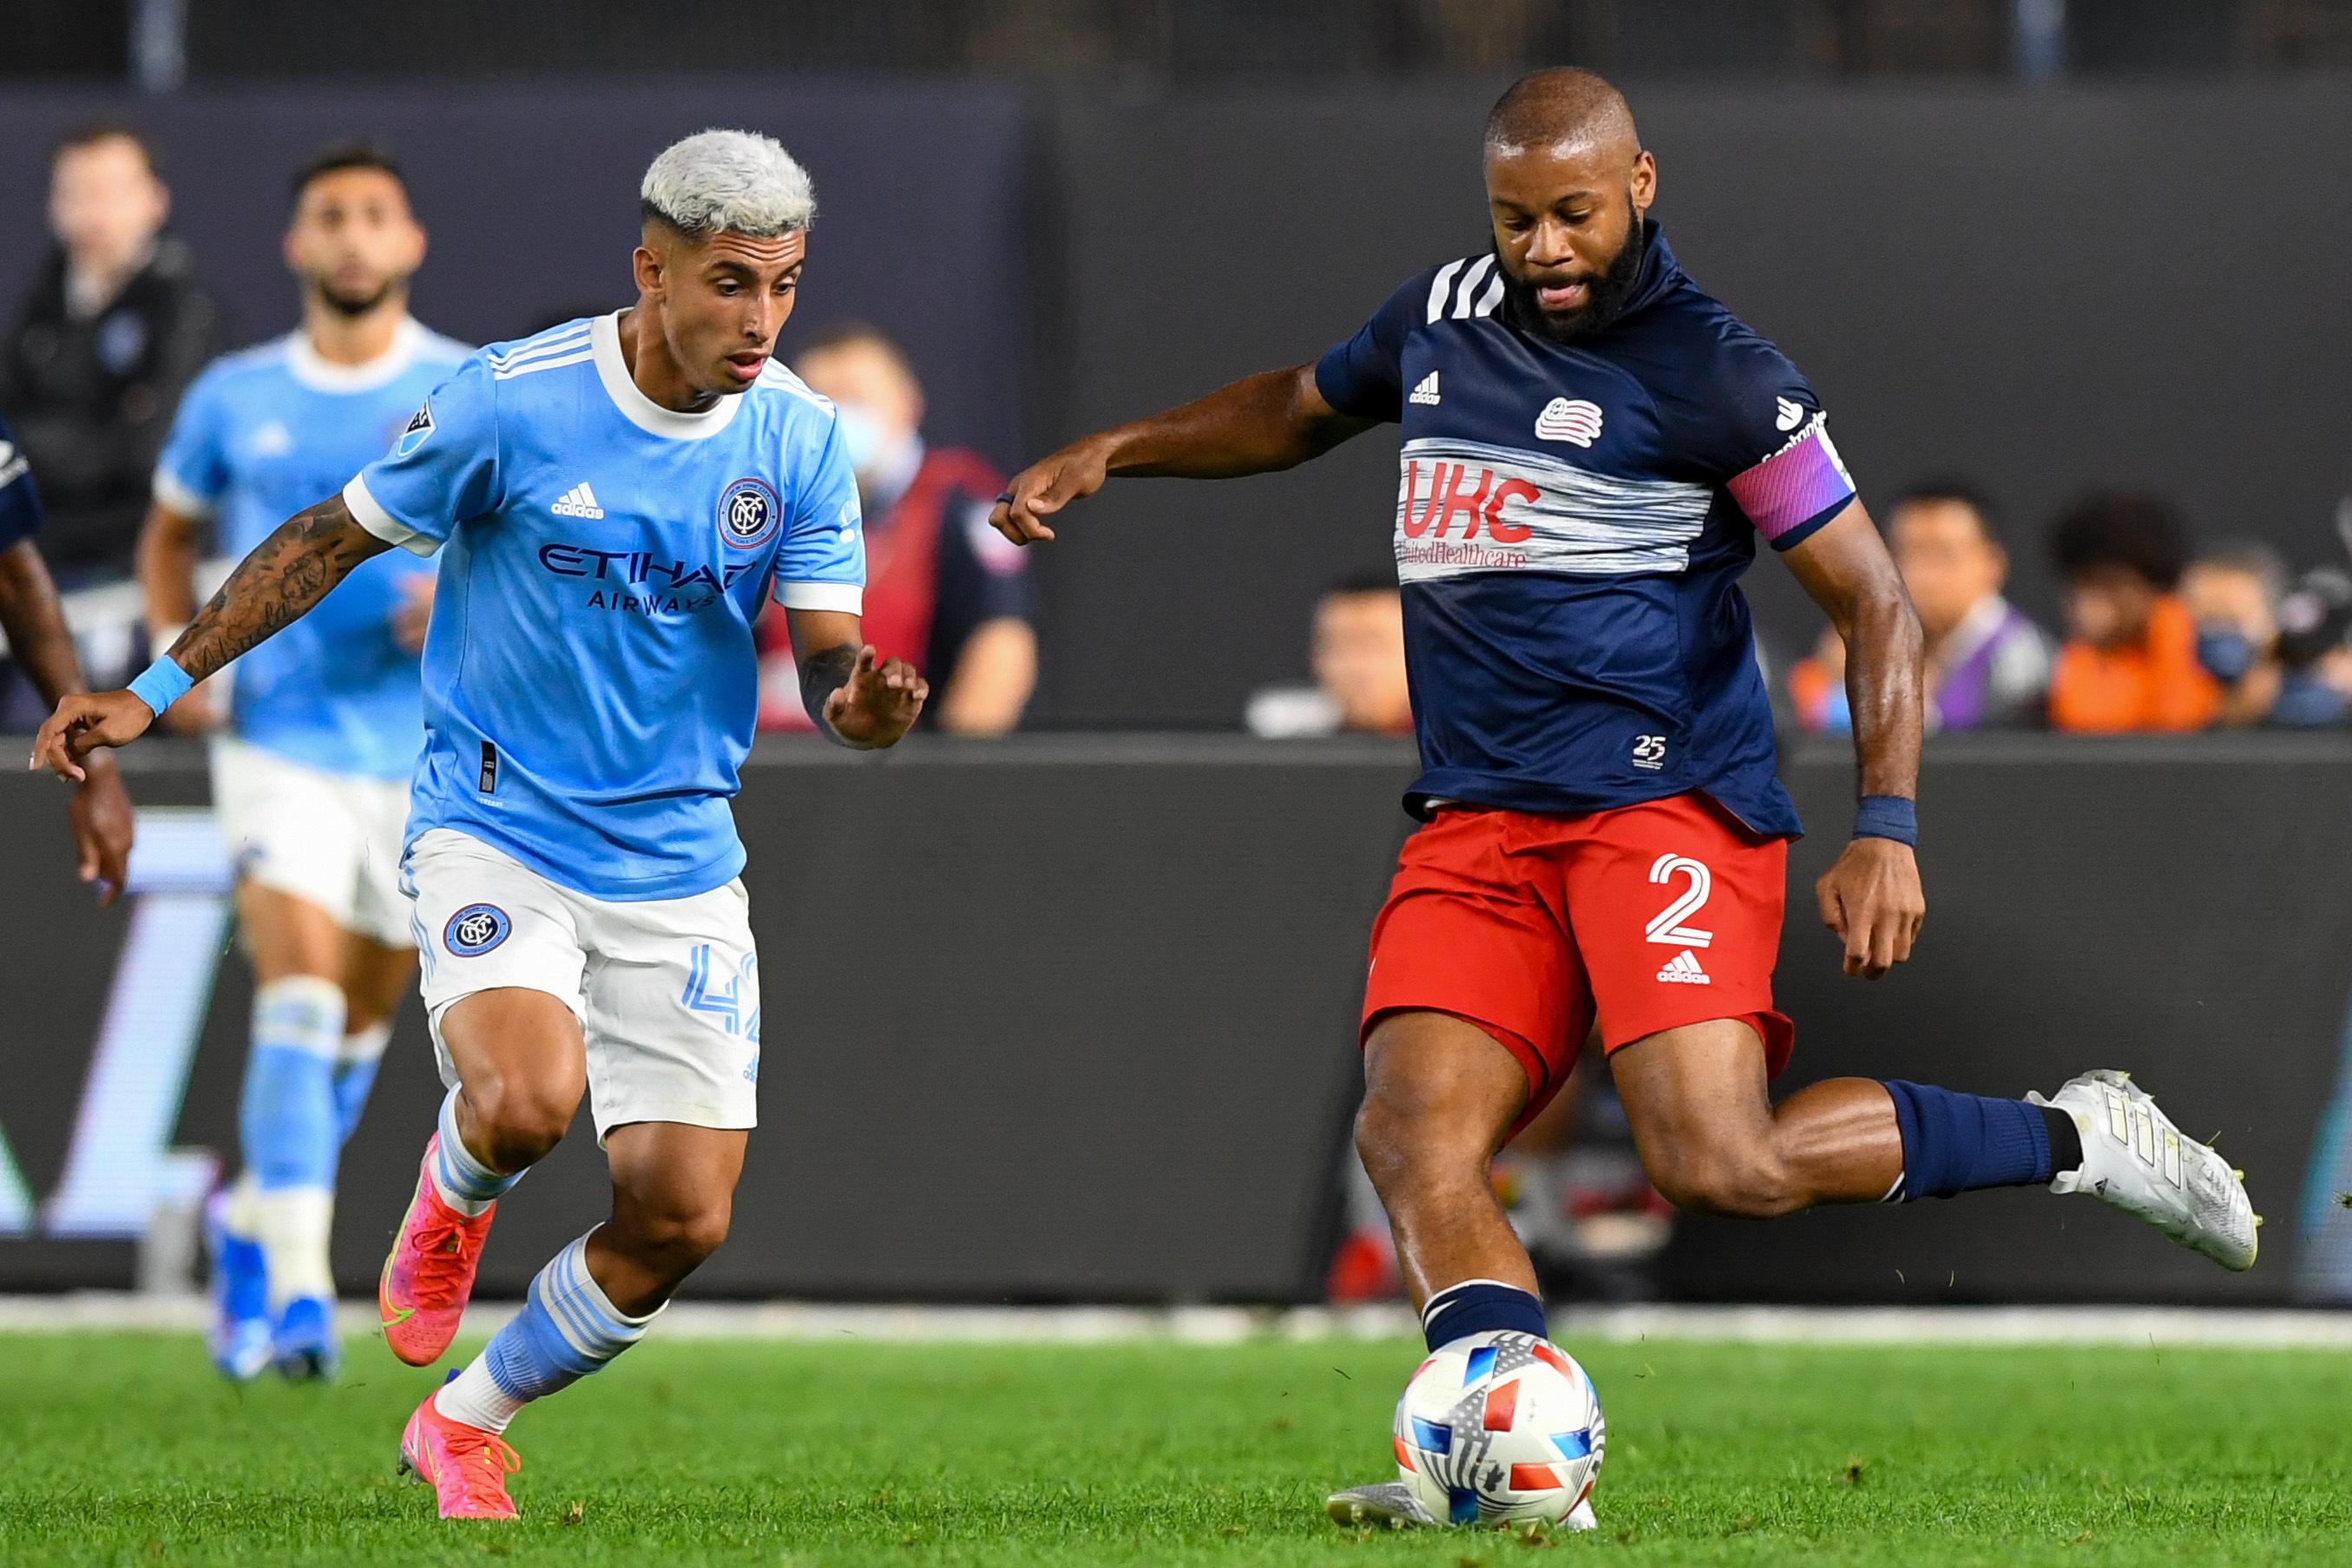 MLS: New England Revolution at New York City FC